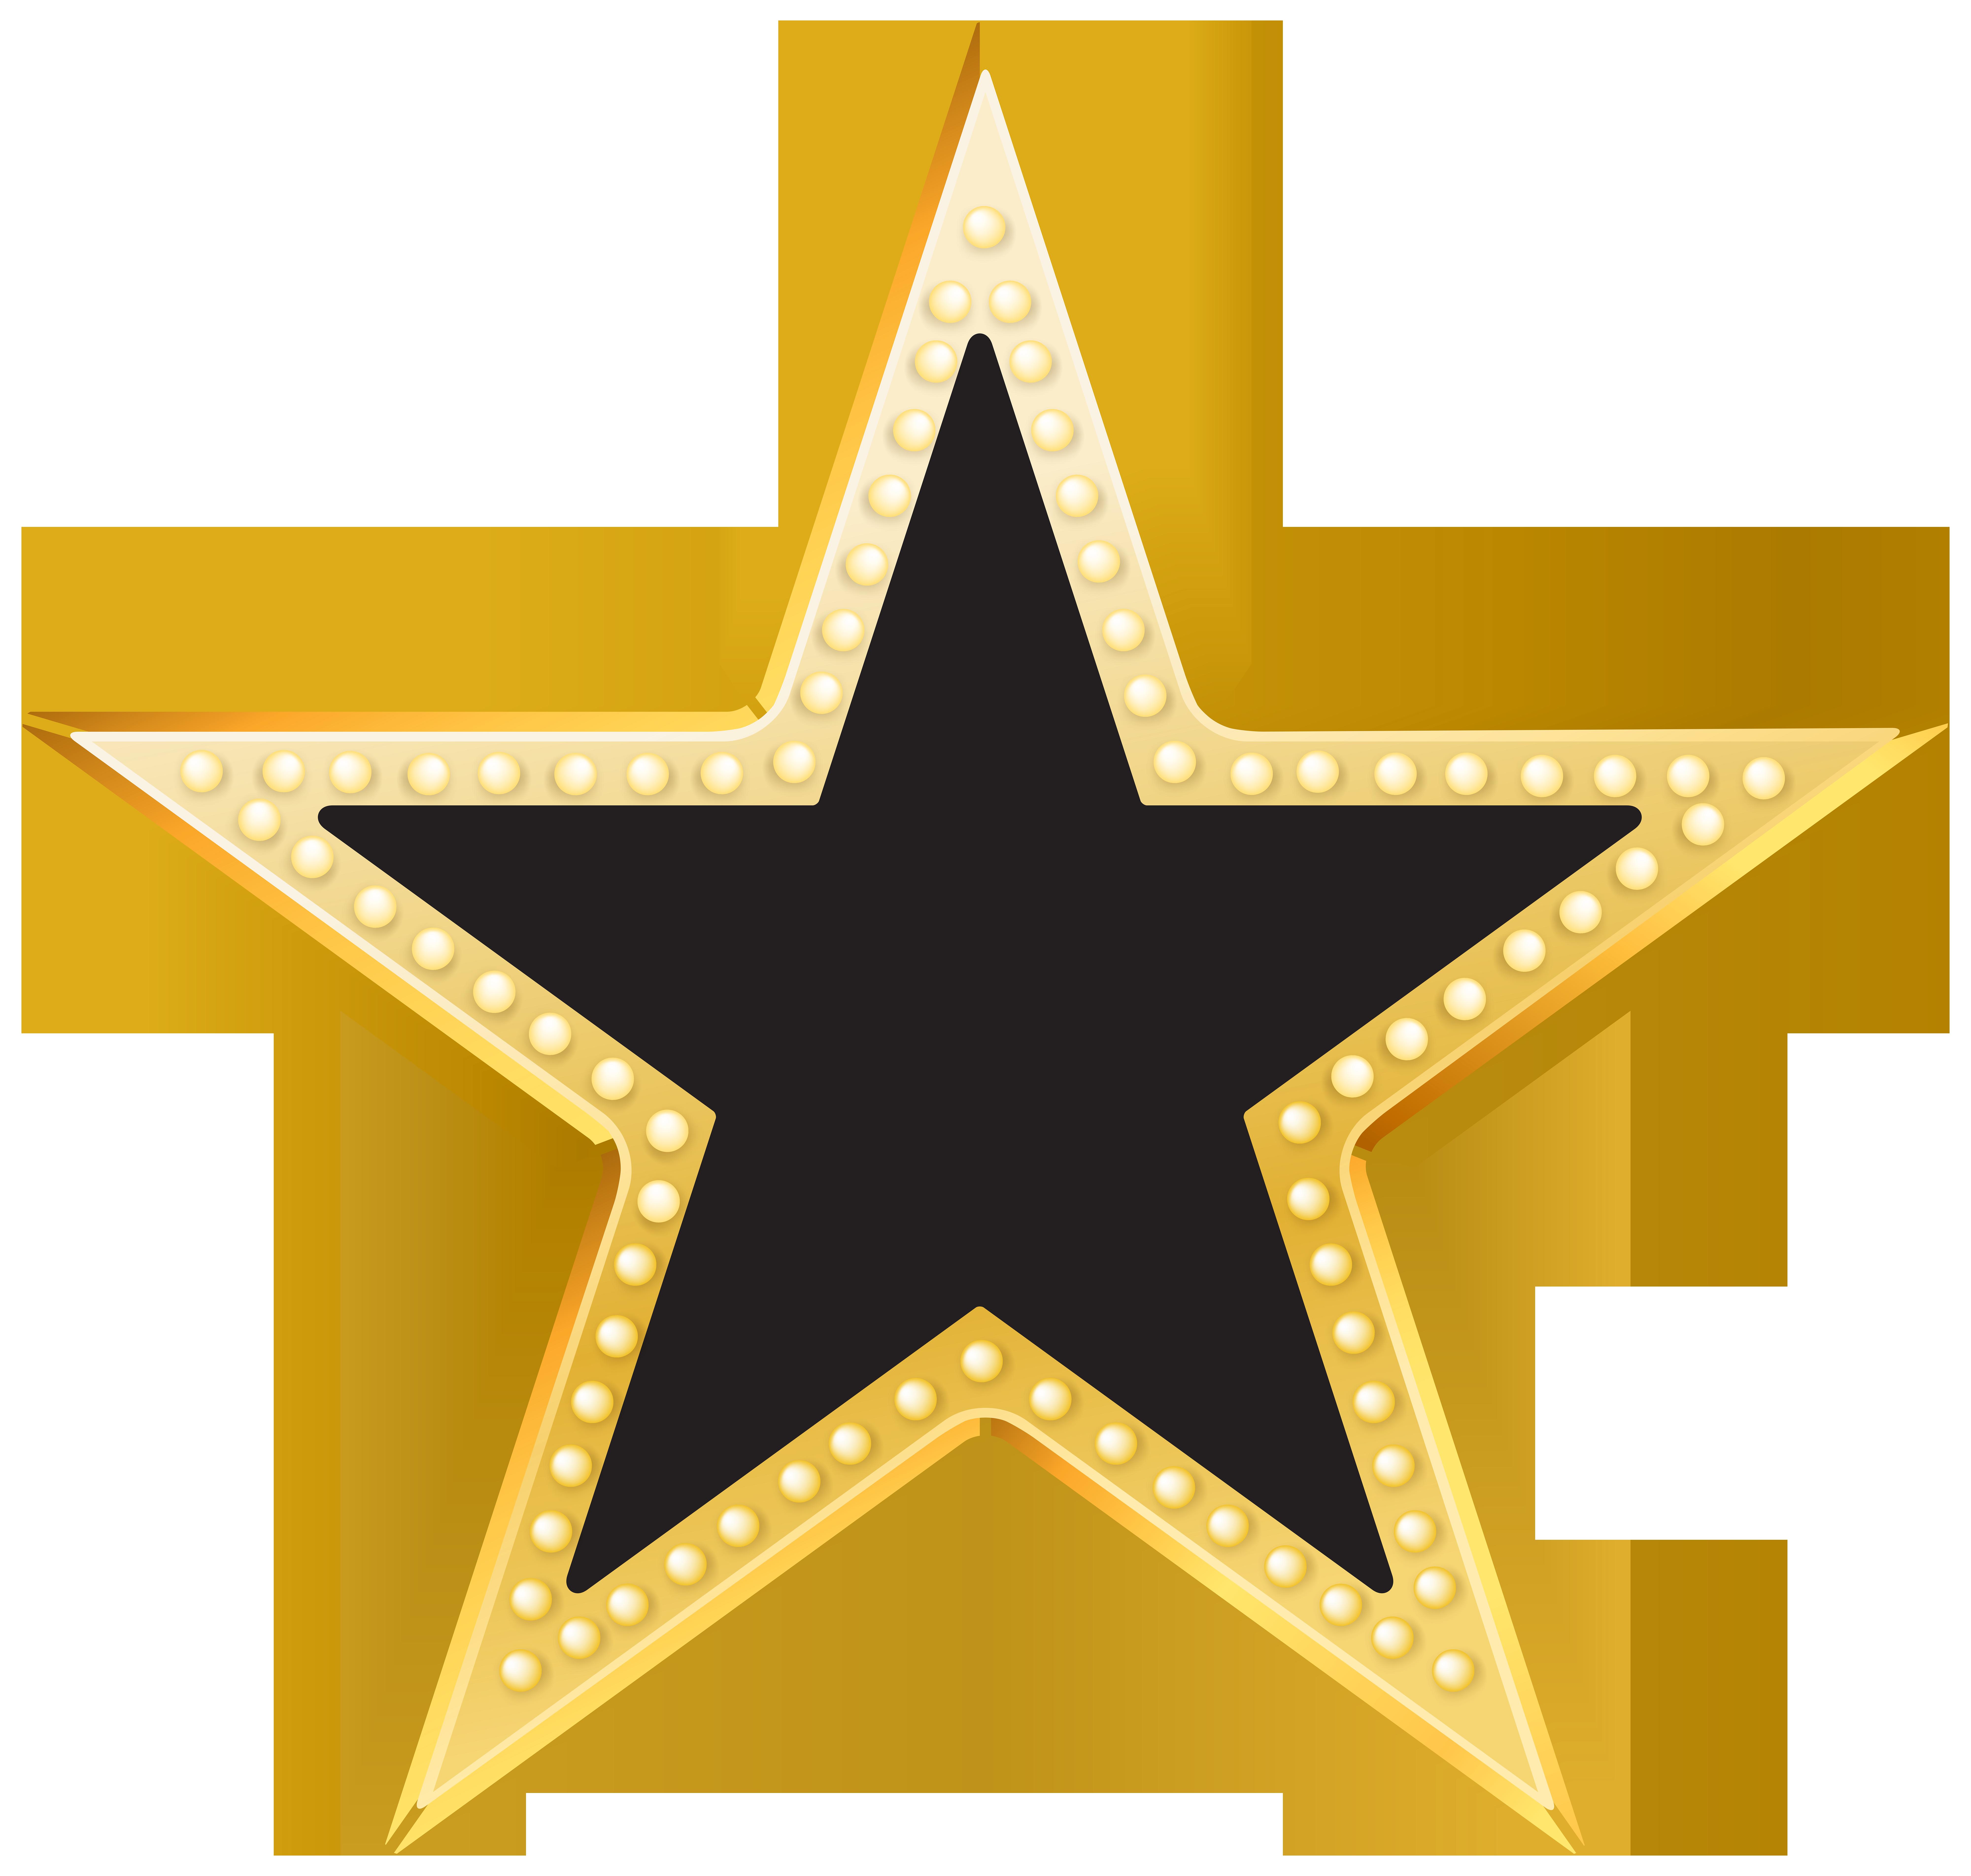 Gold and Black Star PNG Transparent Clip Art Image.